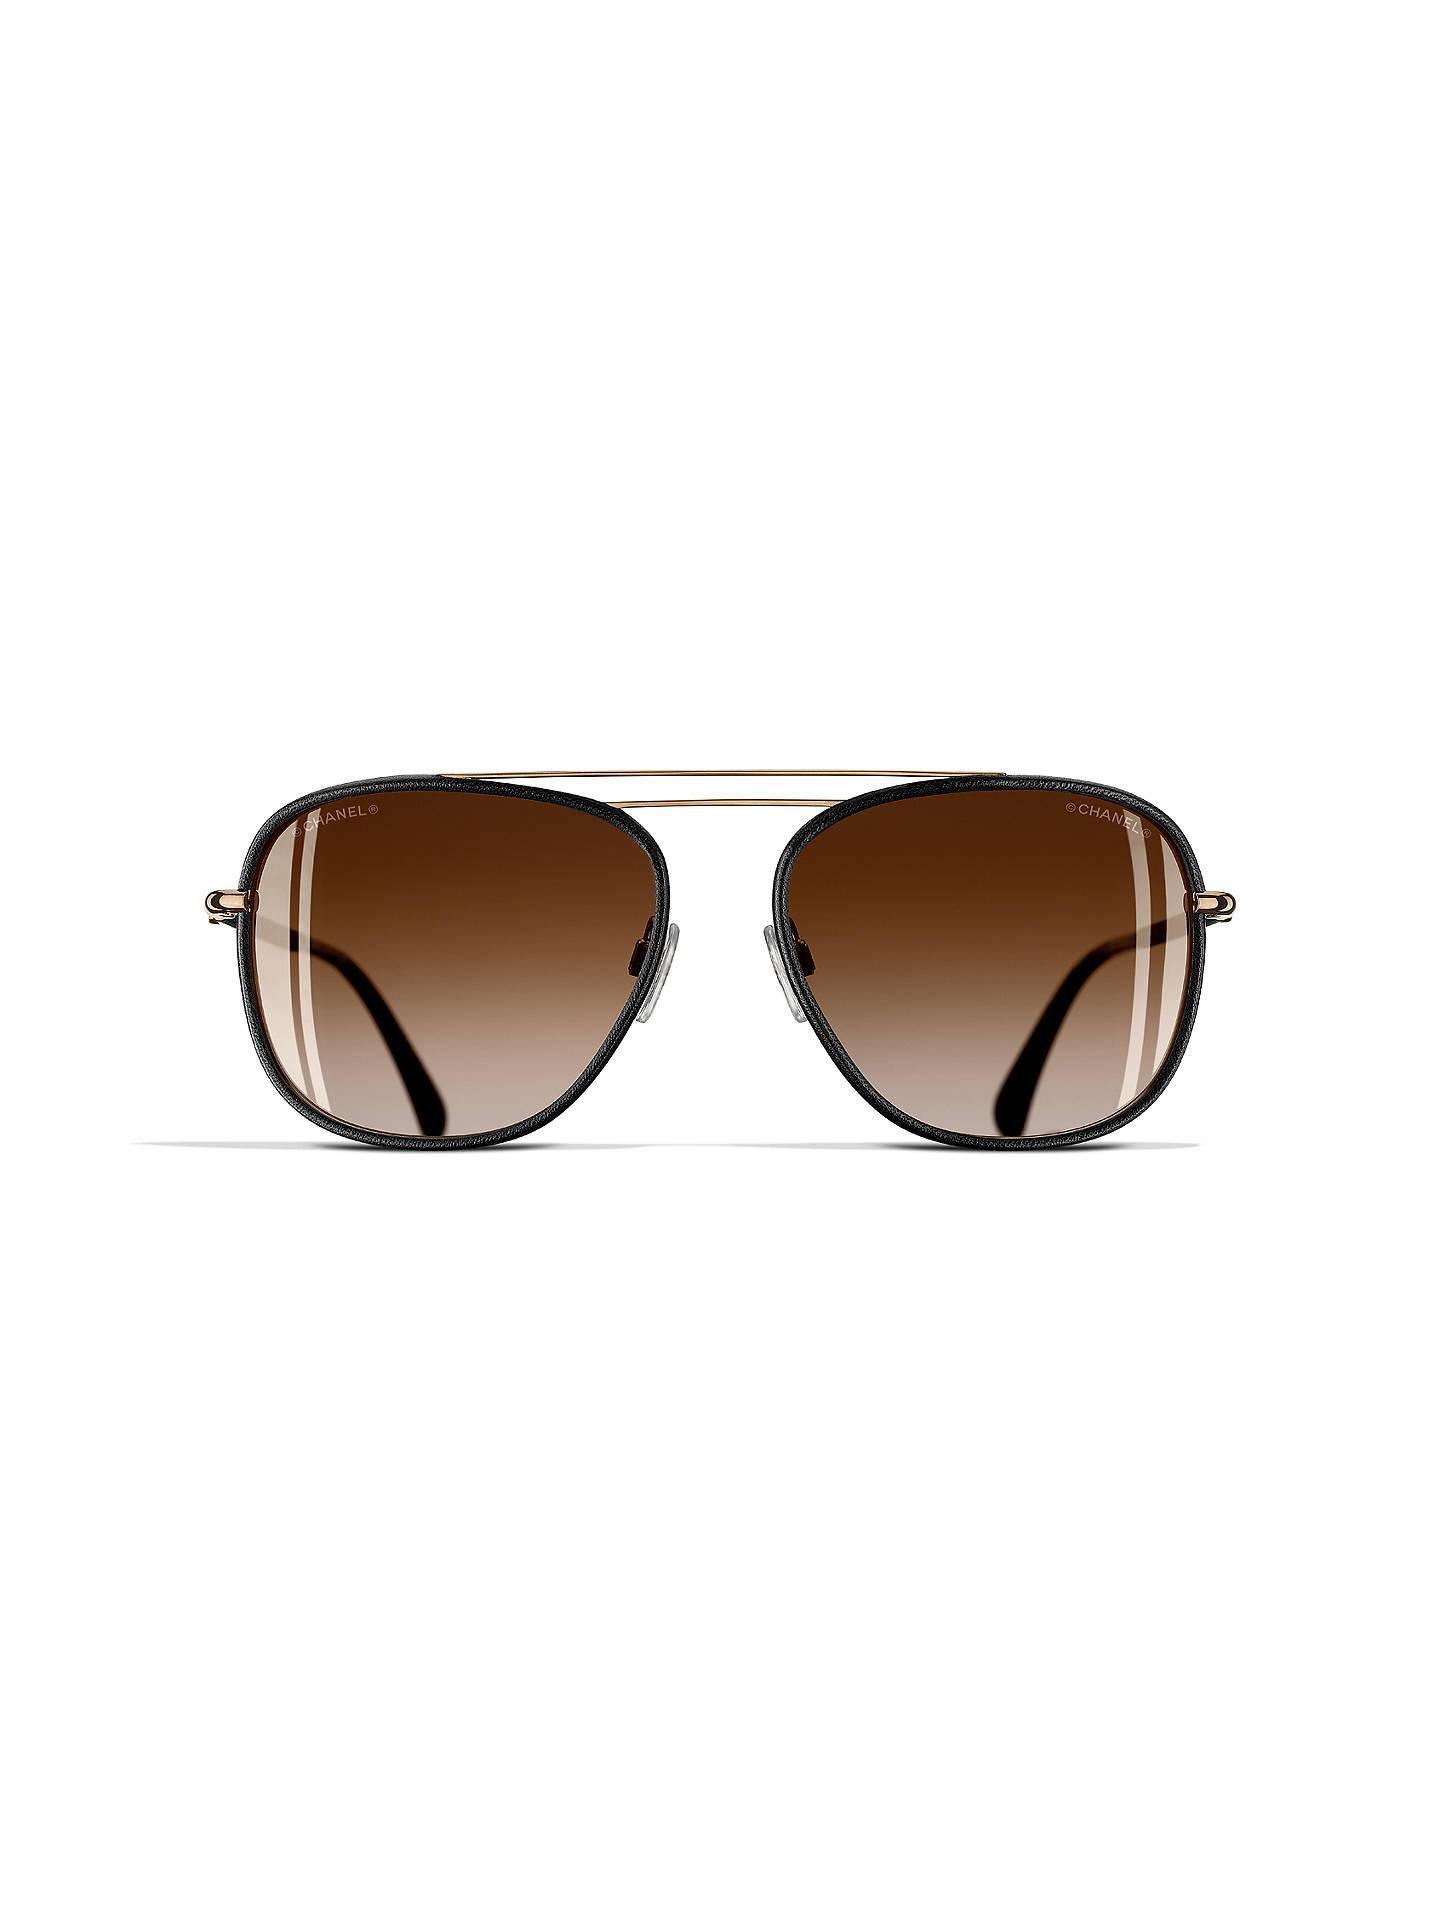 98aa8549883 ... Buy CHANEL Pilot Sunglasses CH4230Q Black Gold Online at johnlewis.com  ...